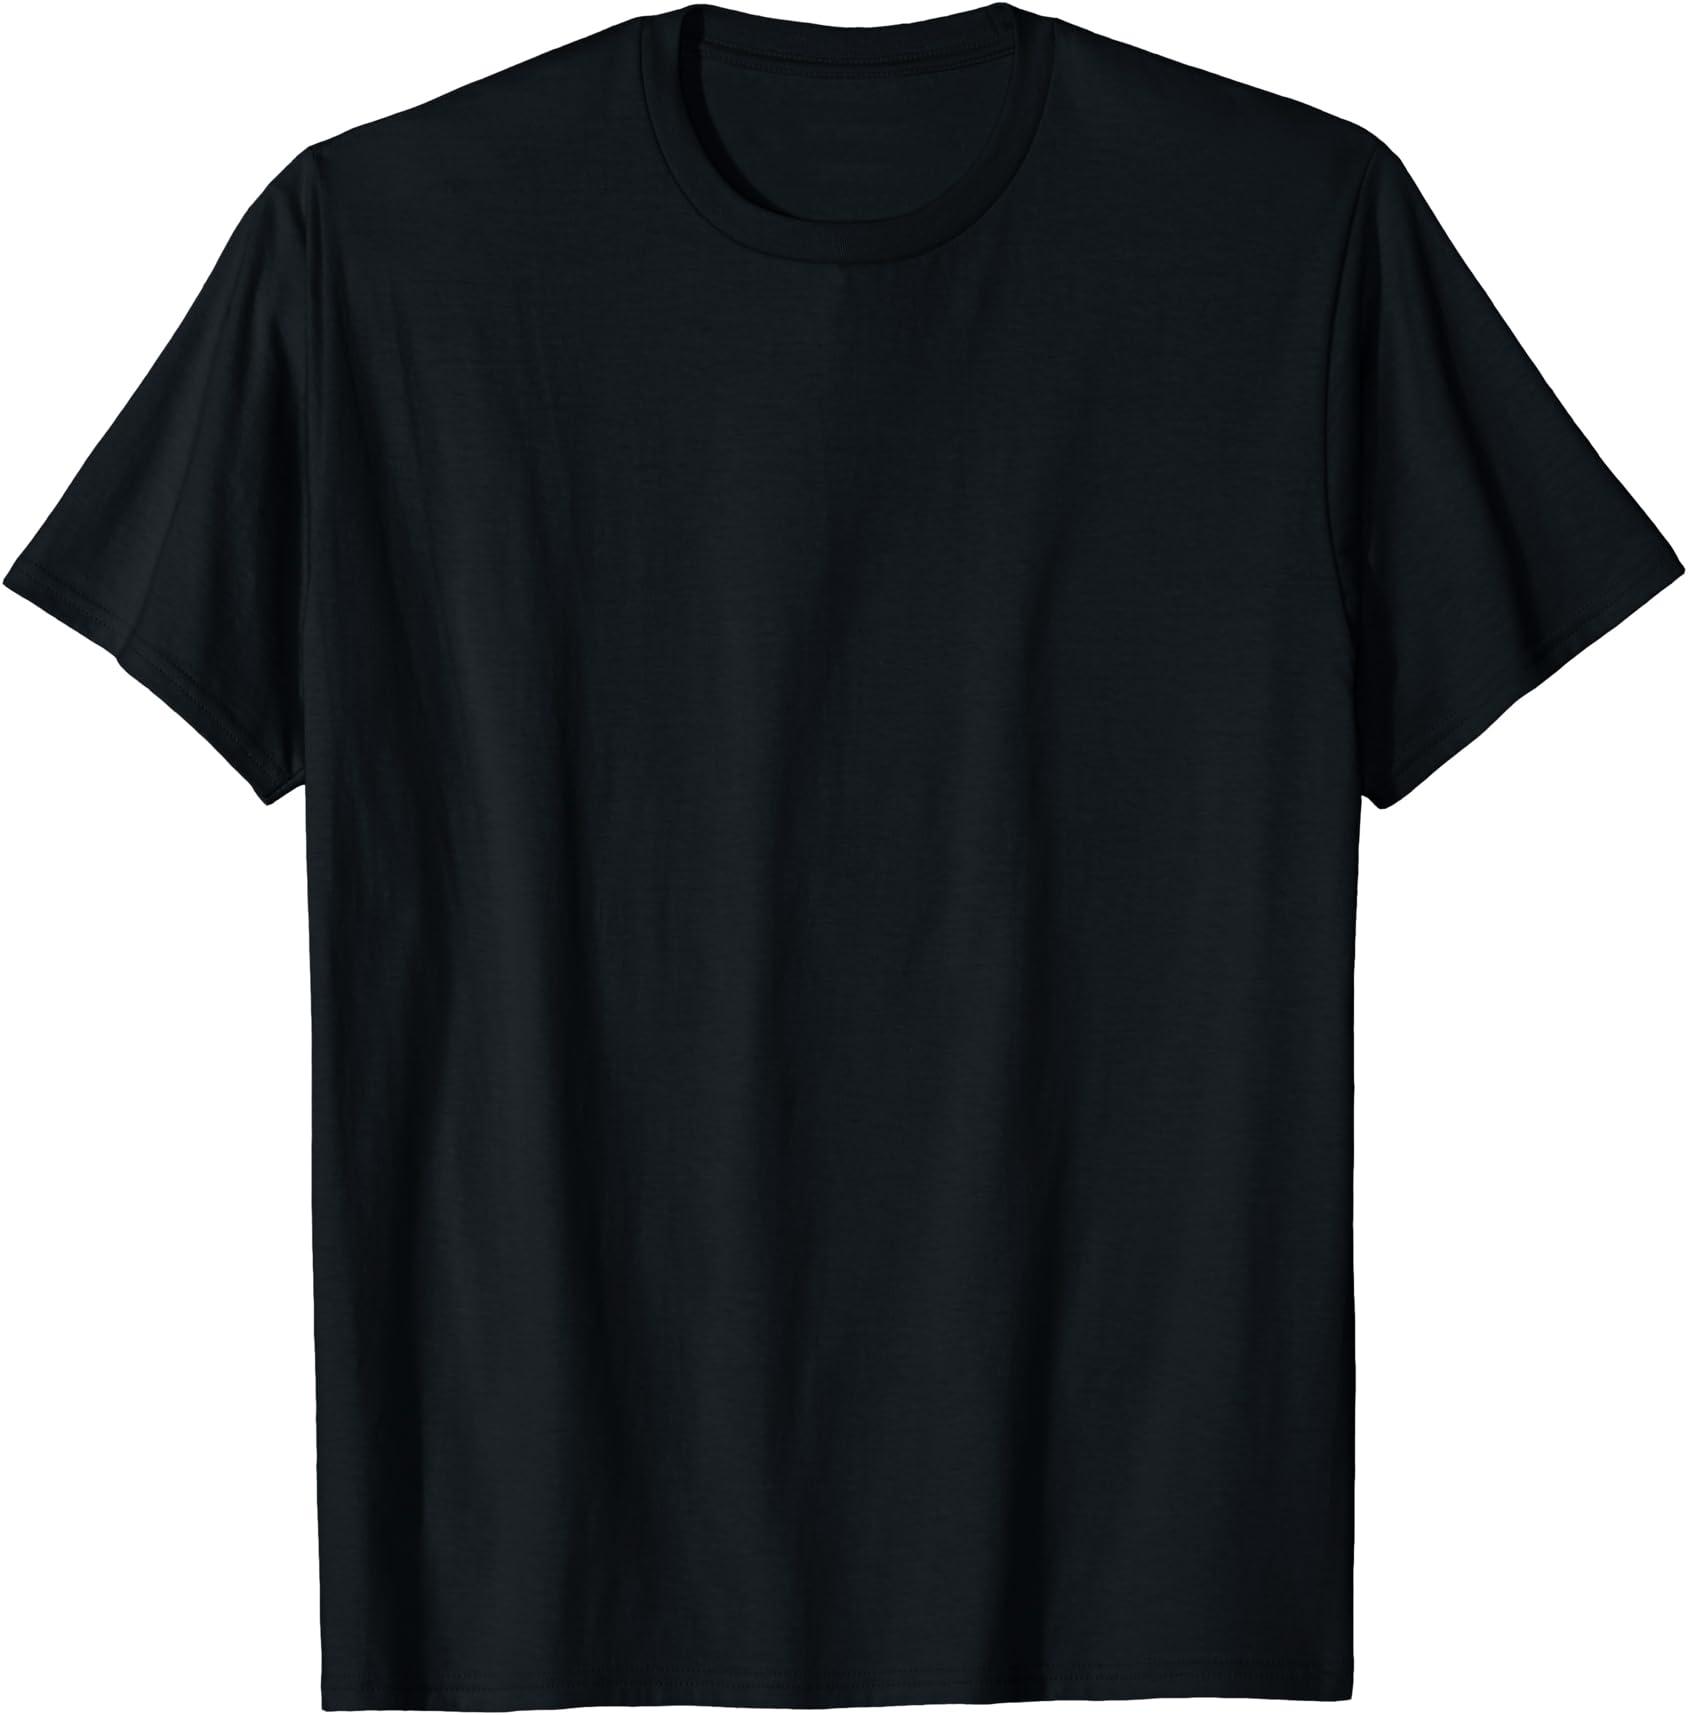 Flamingo New T-Shirt Art Graphic Design Top